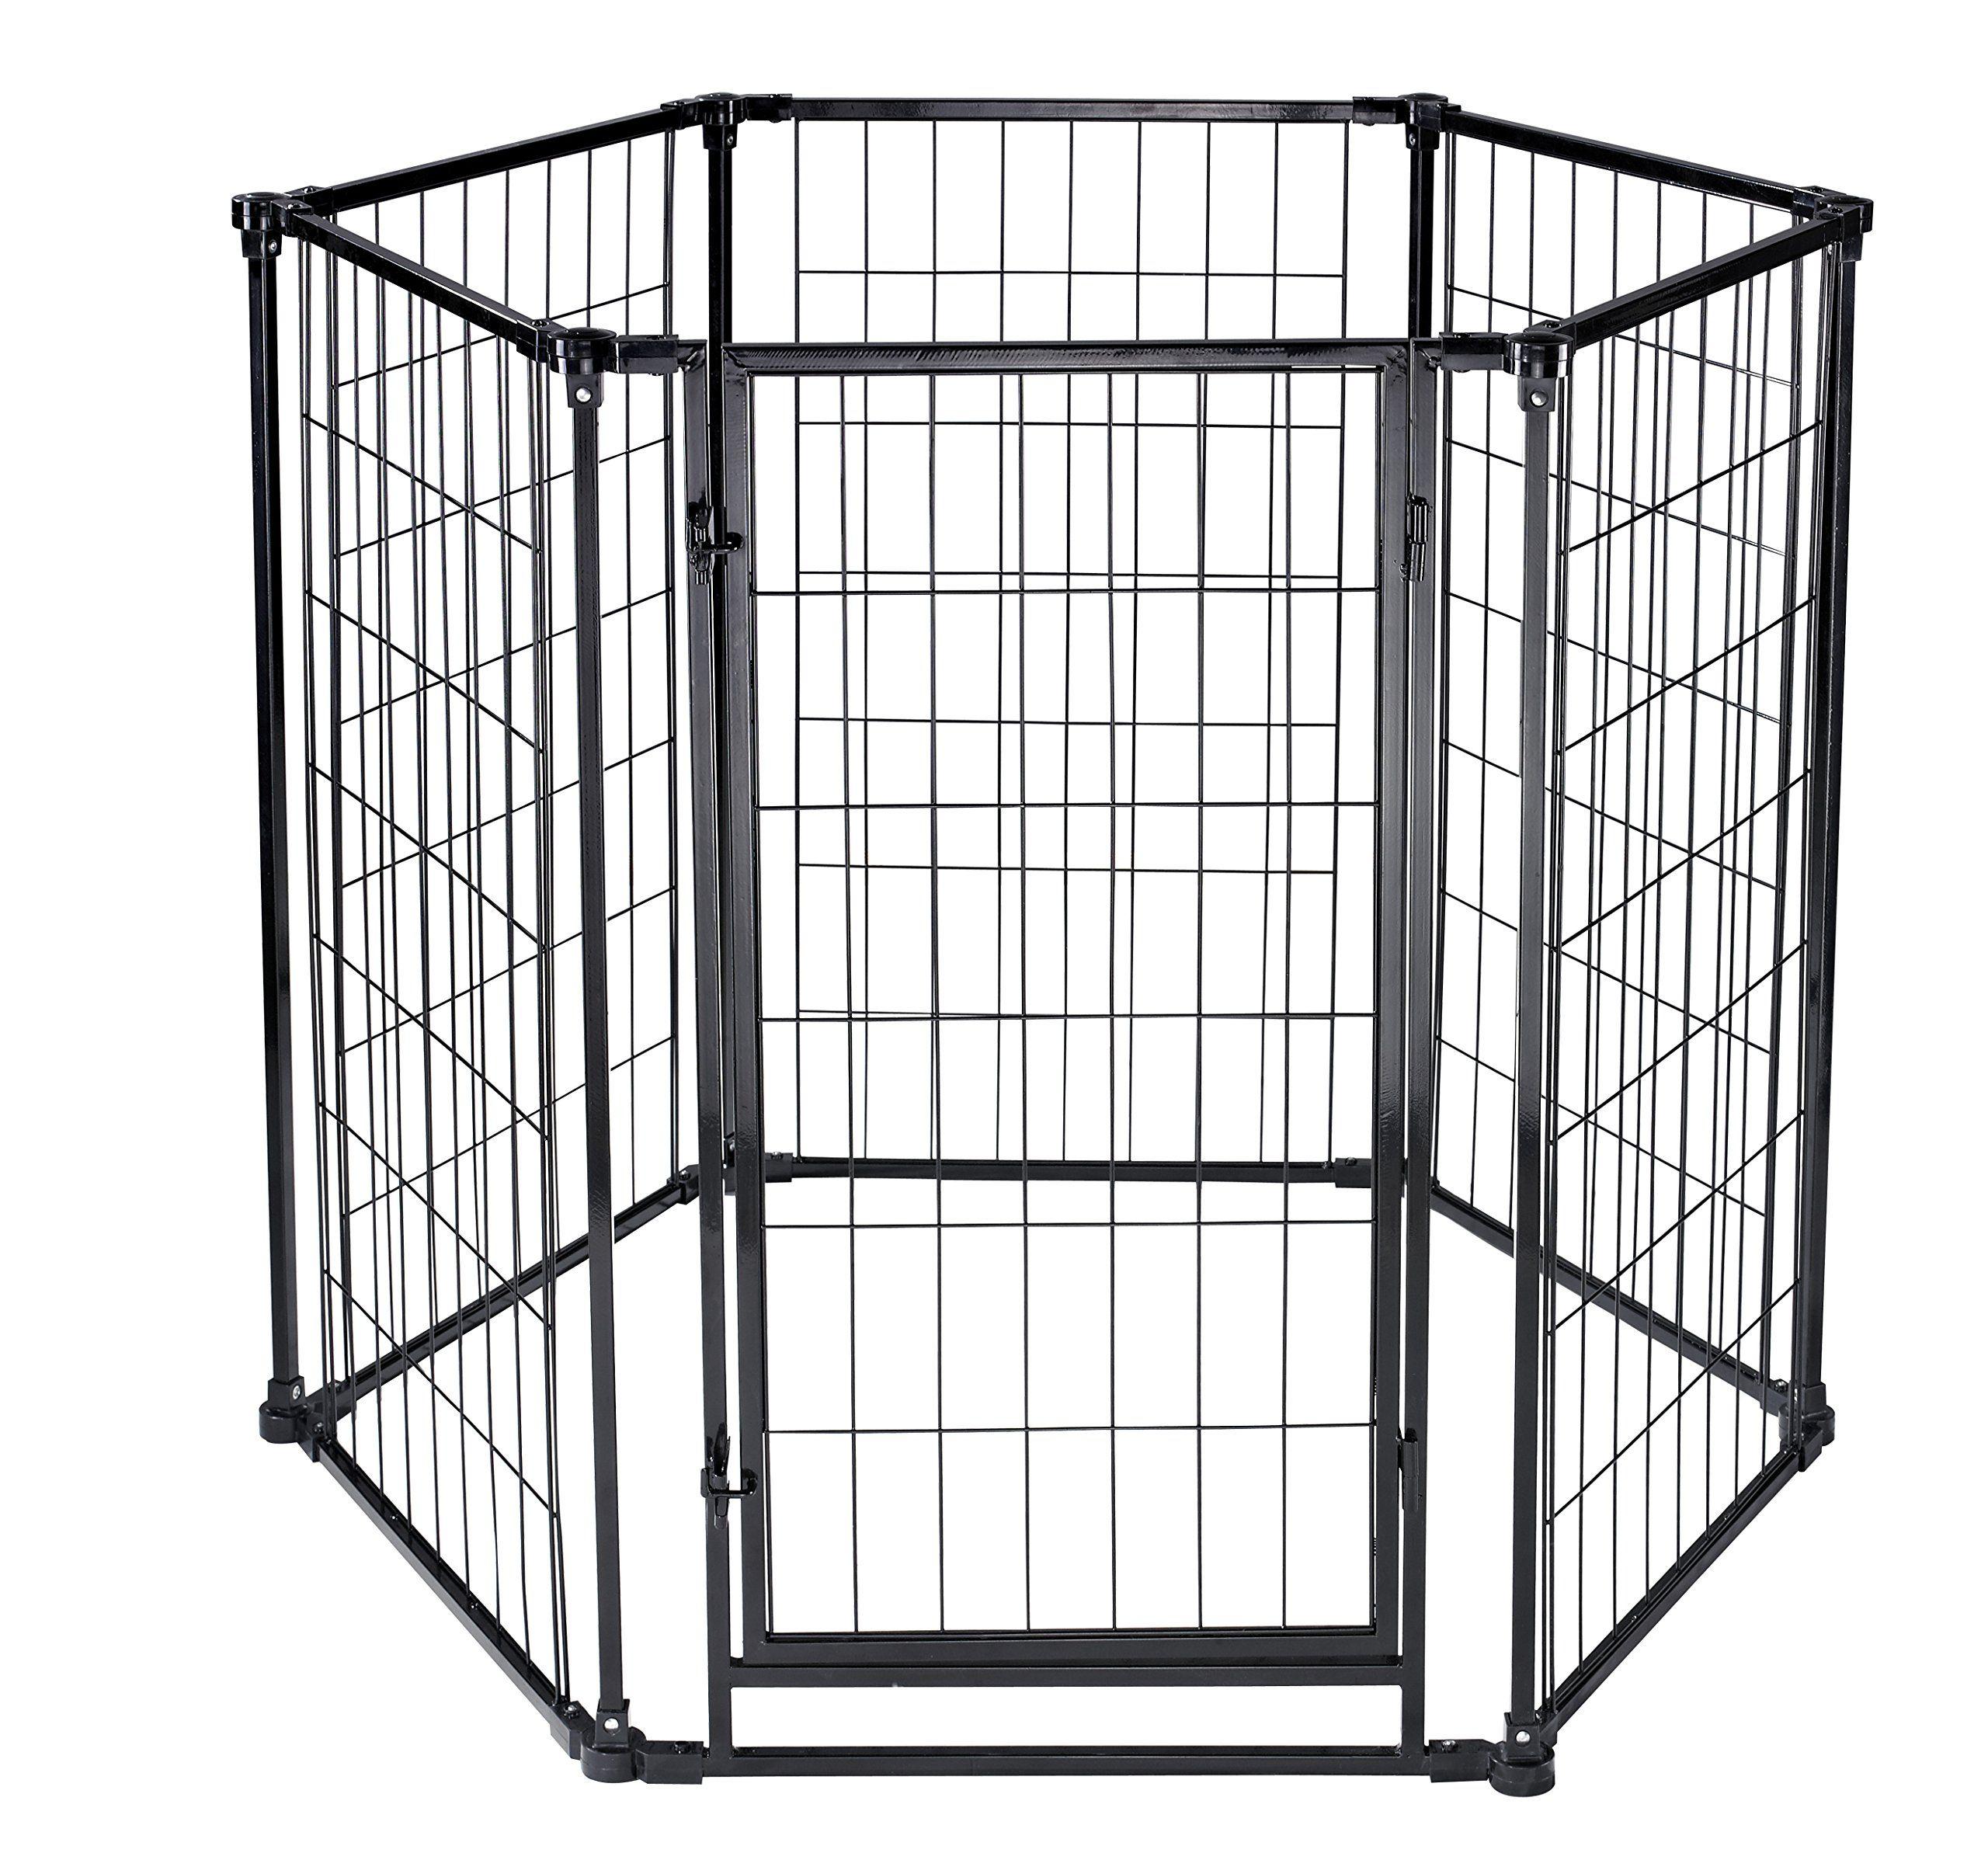 6 panels homey pet 3 in 1 playardwallmount gate